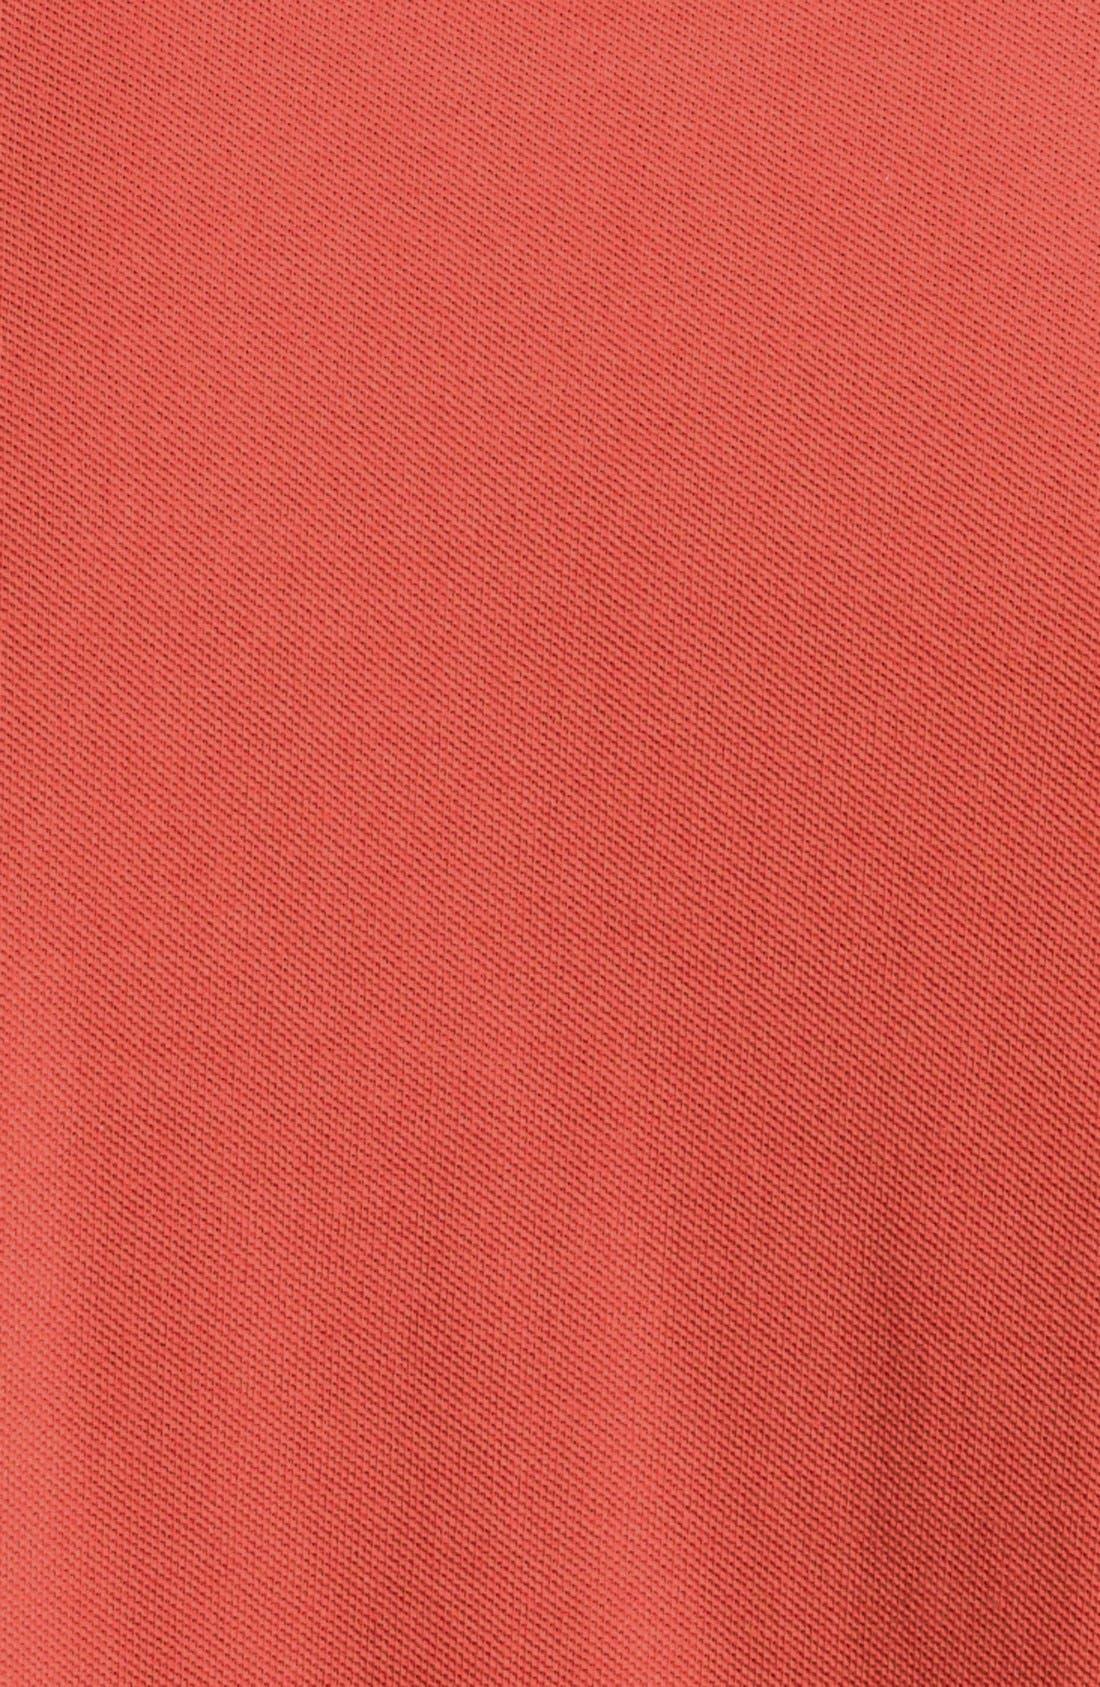 Alternate Image 3  - Paul Smith Jeans Piqué Polo